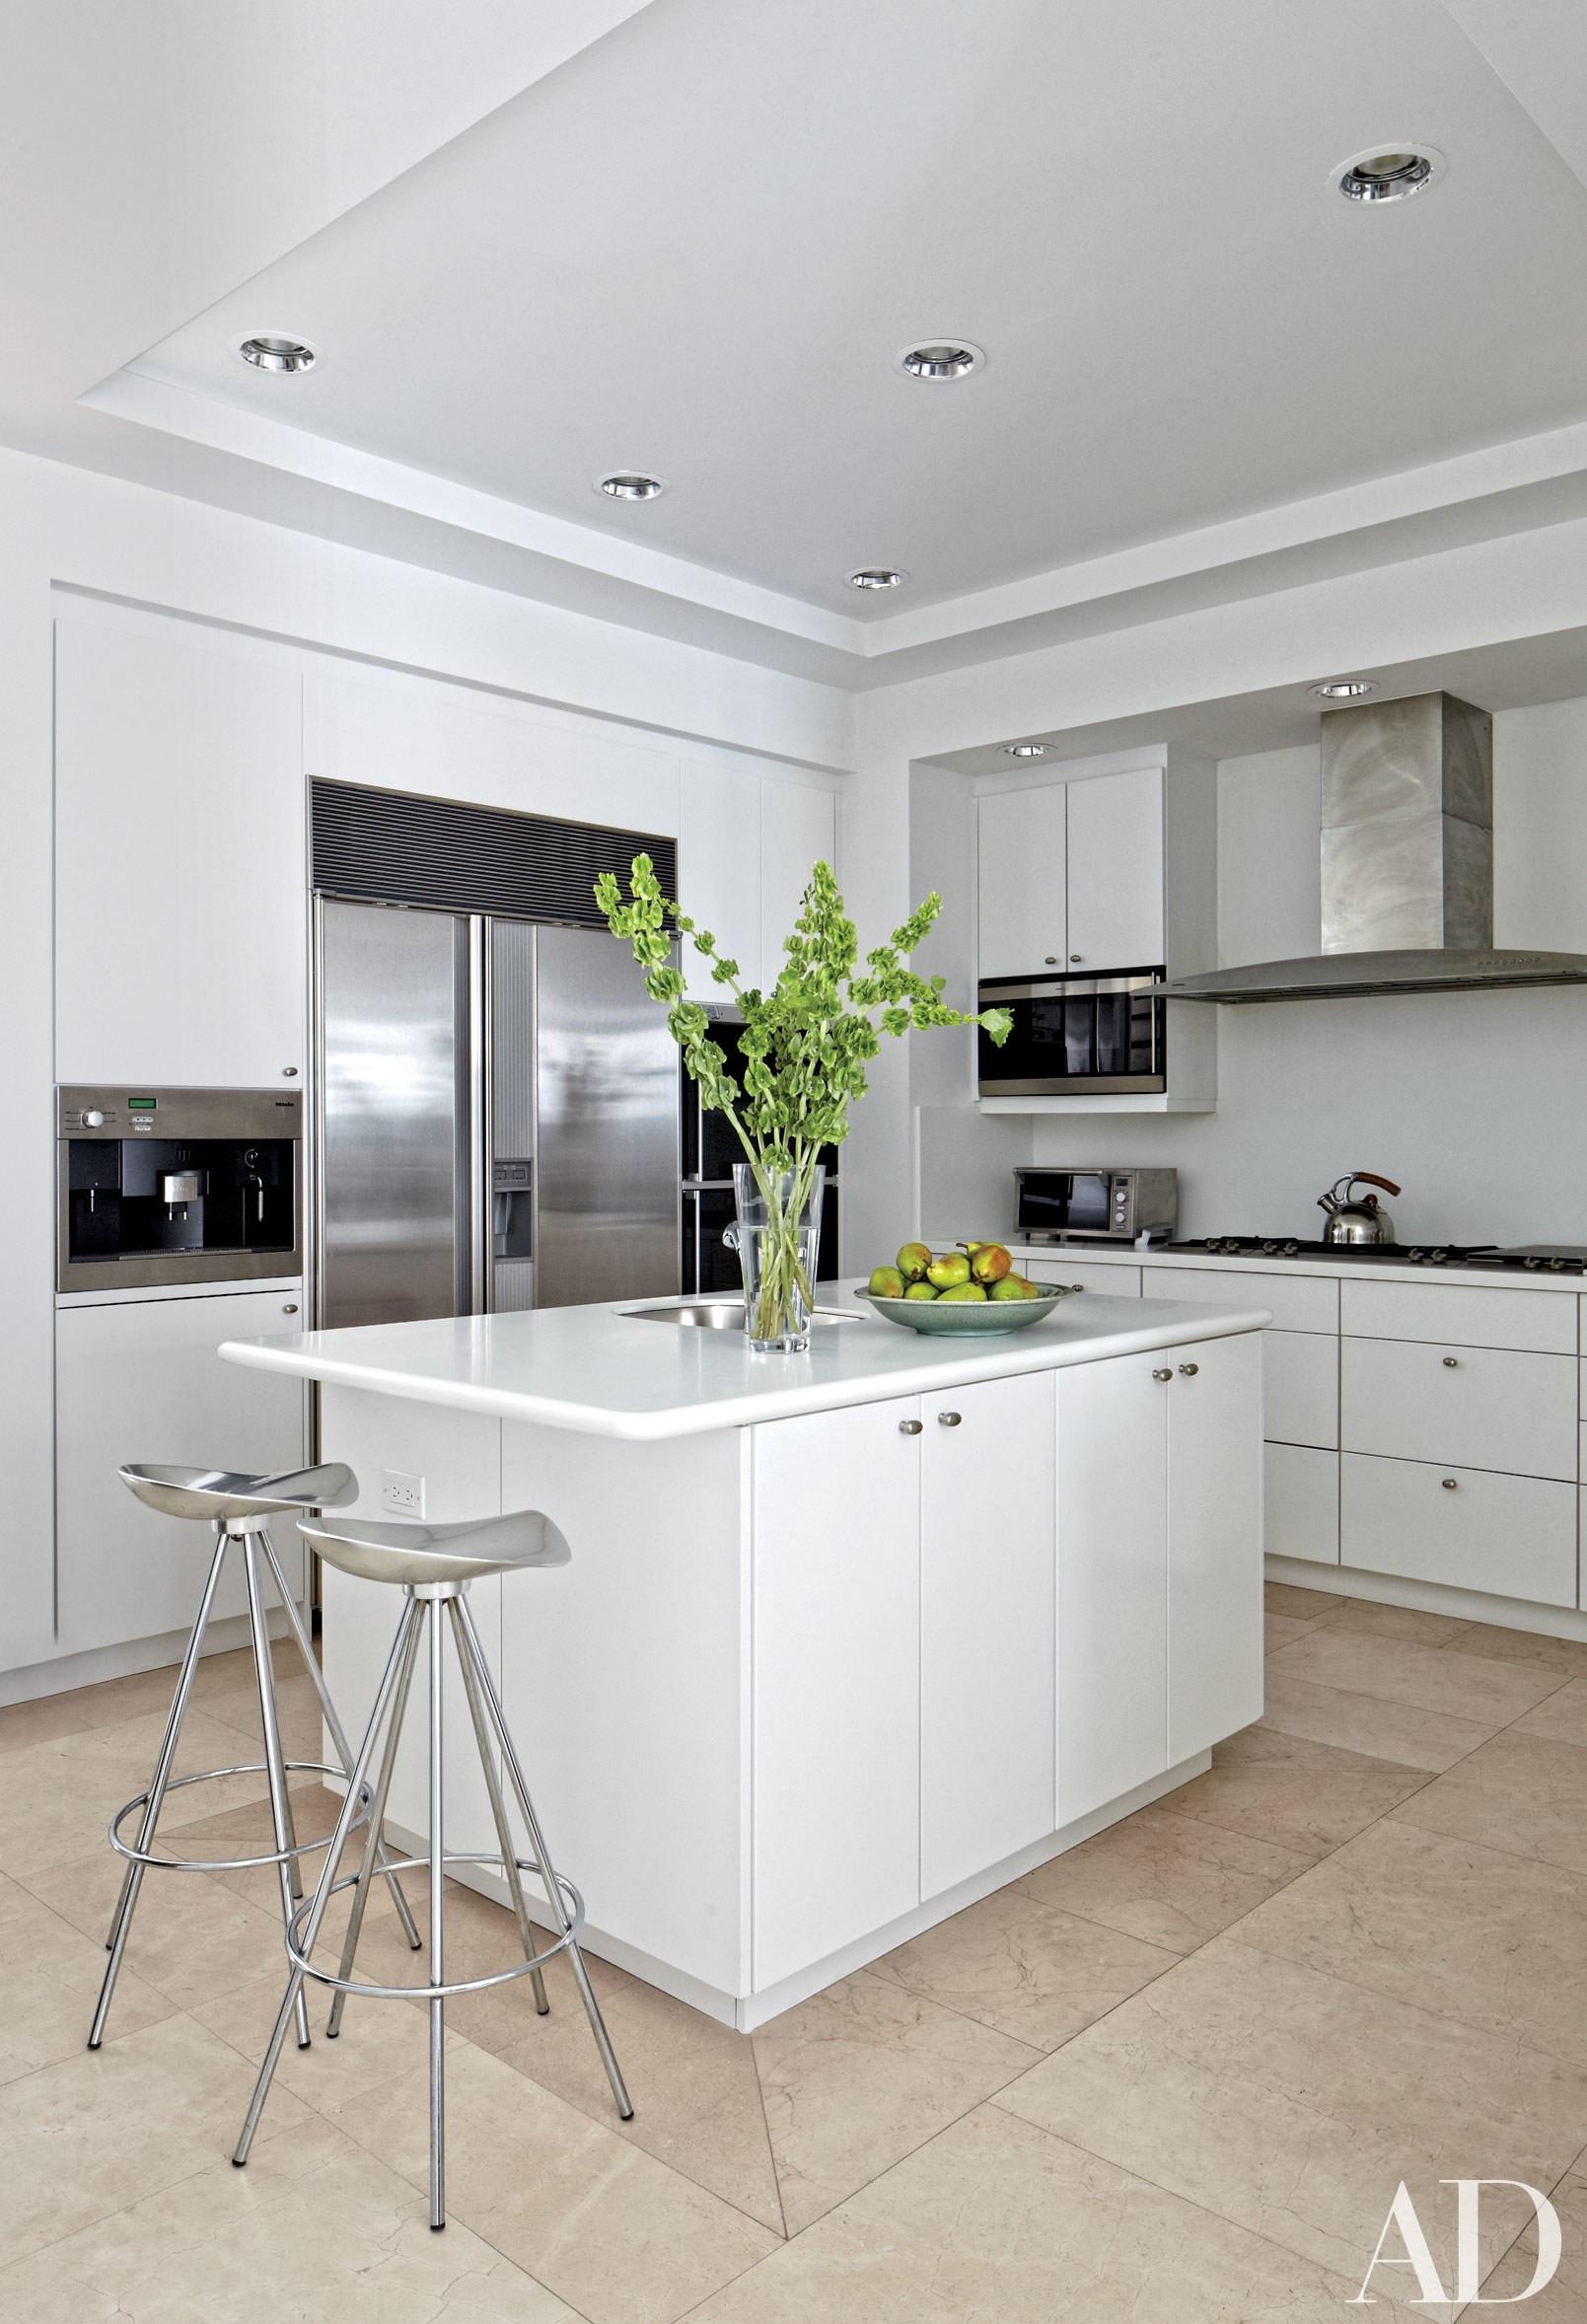 Best ideas about White Kitchen Ideas . Save or Pin White Kitchens Design Ideas s Now.